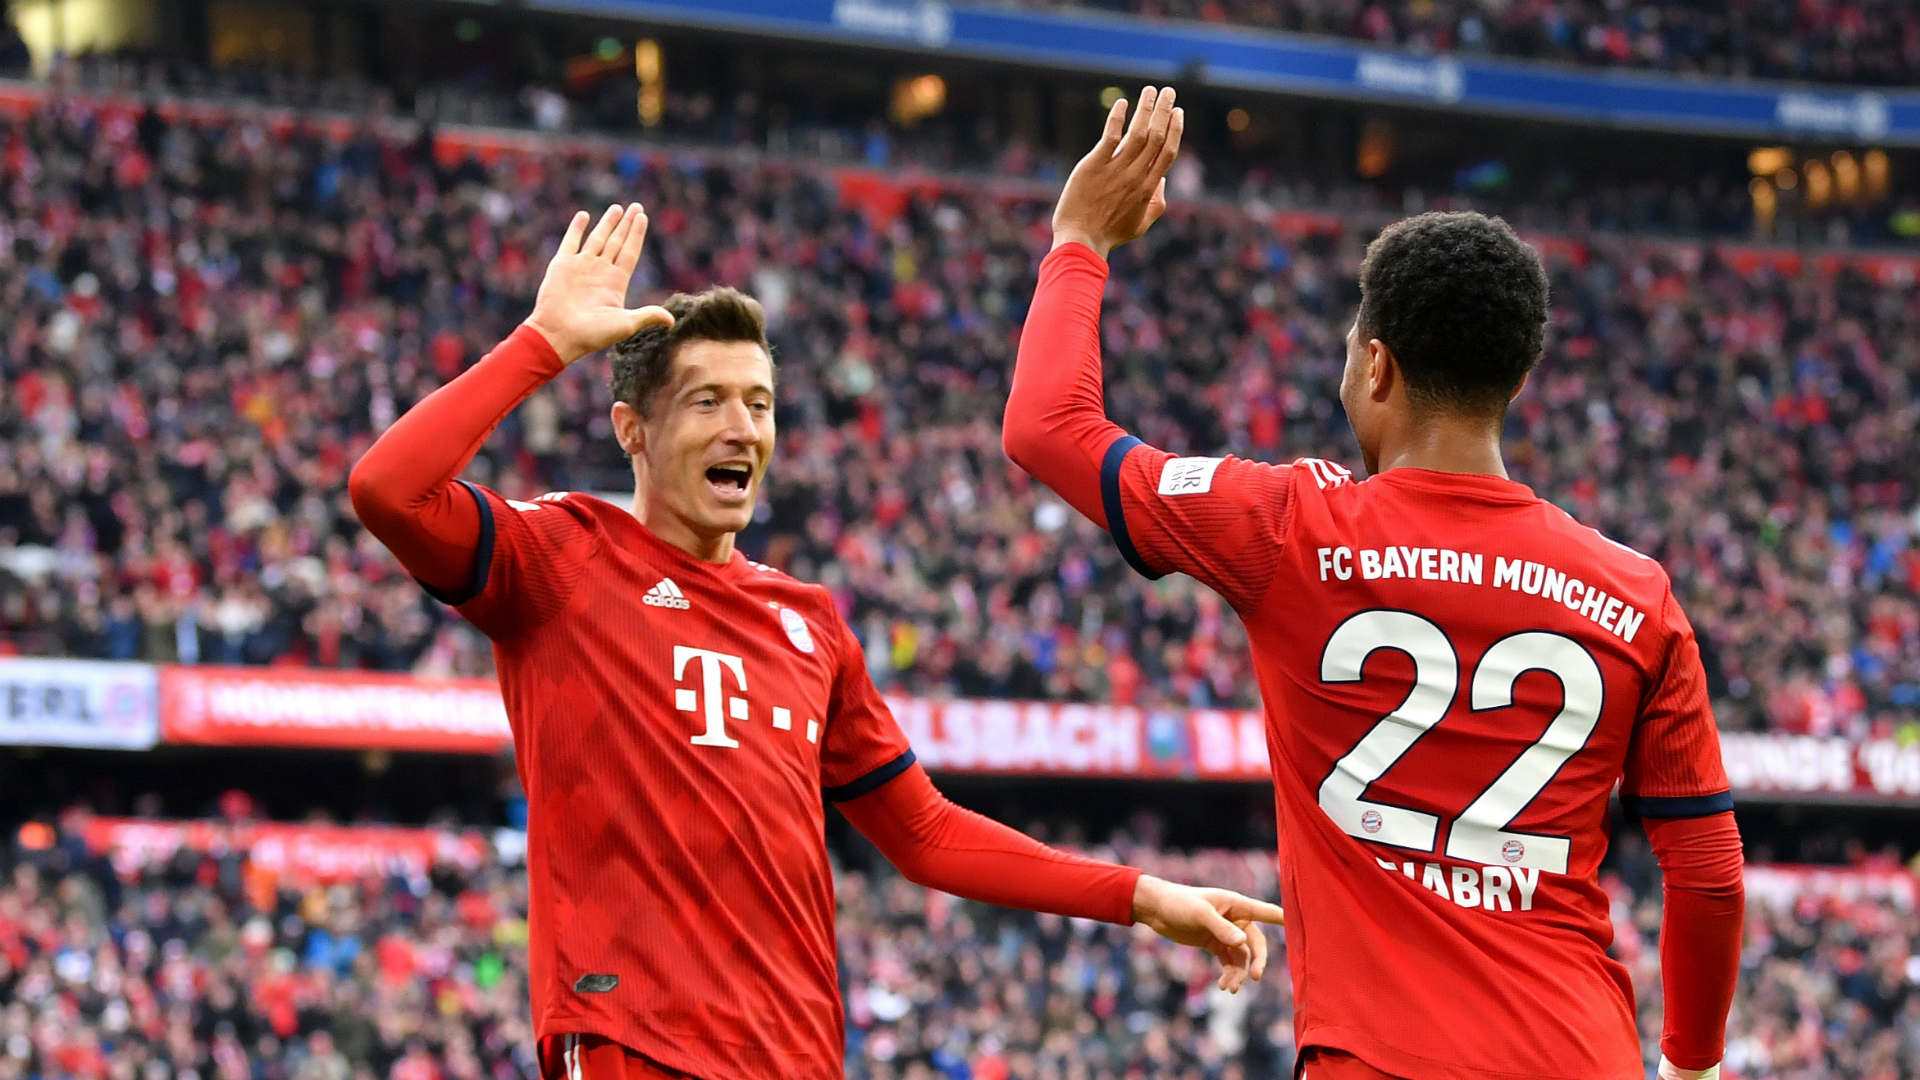 Better for Bundesliga if Bayern Munich don't win title - Arnold